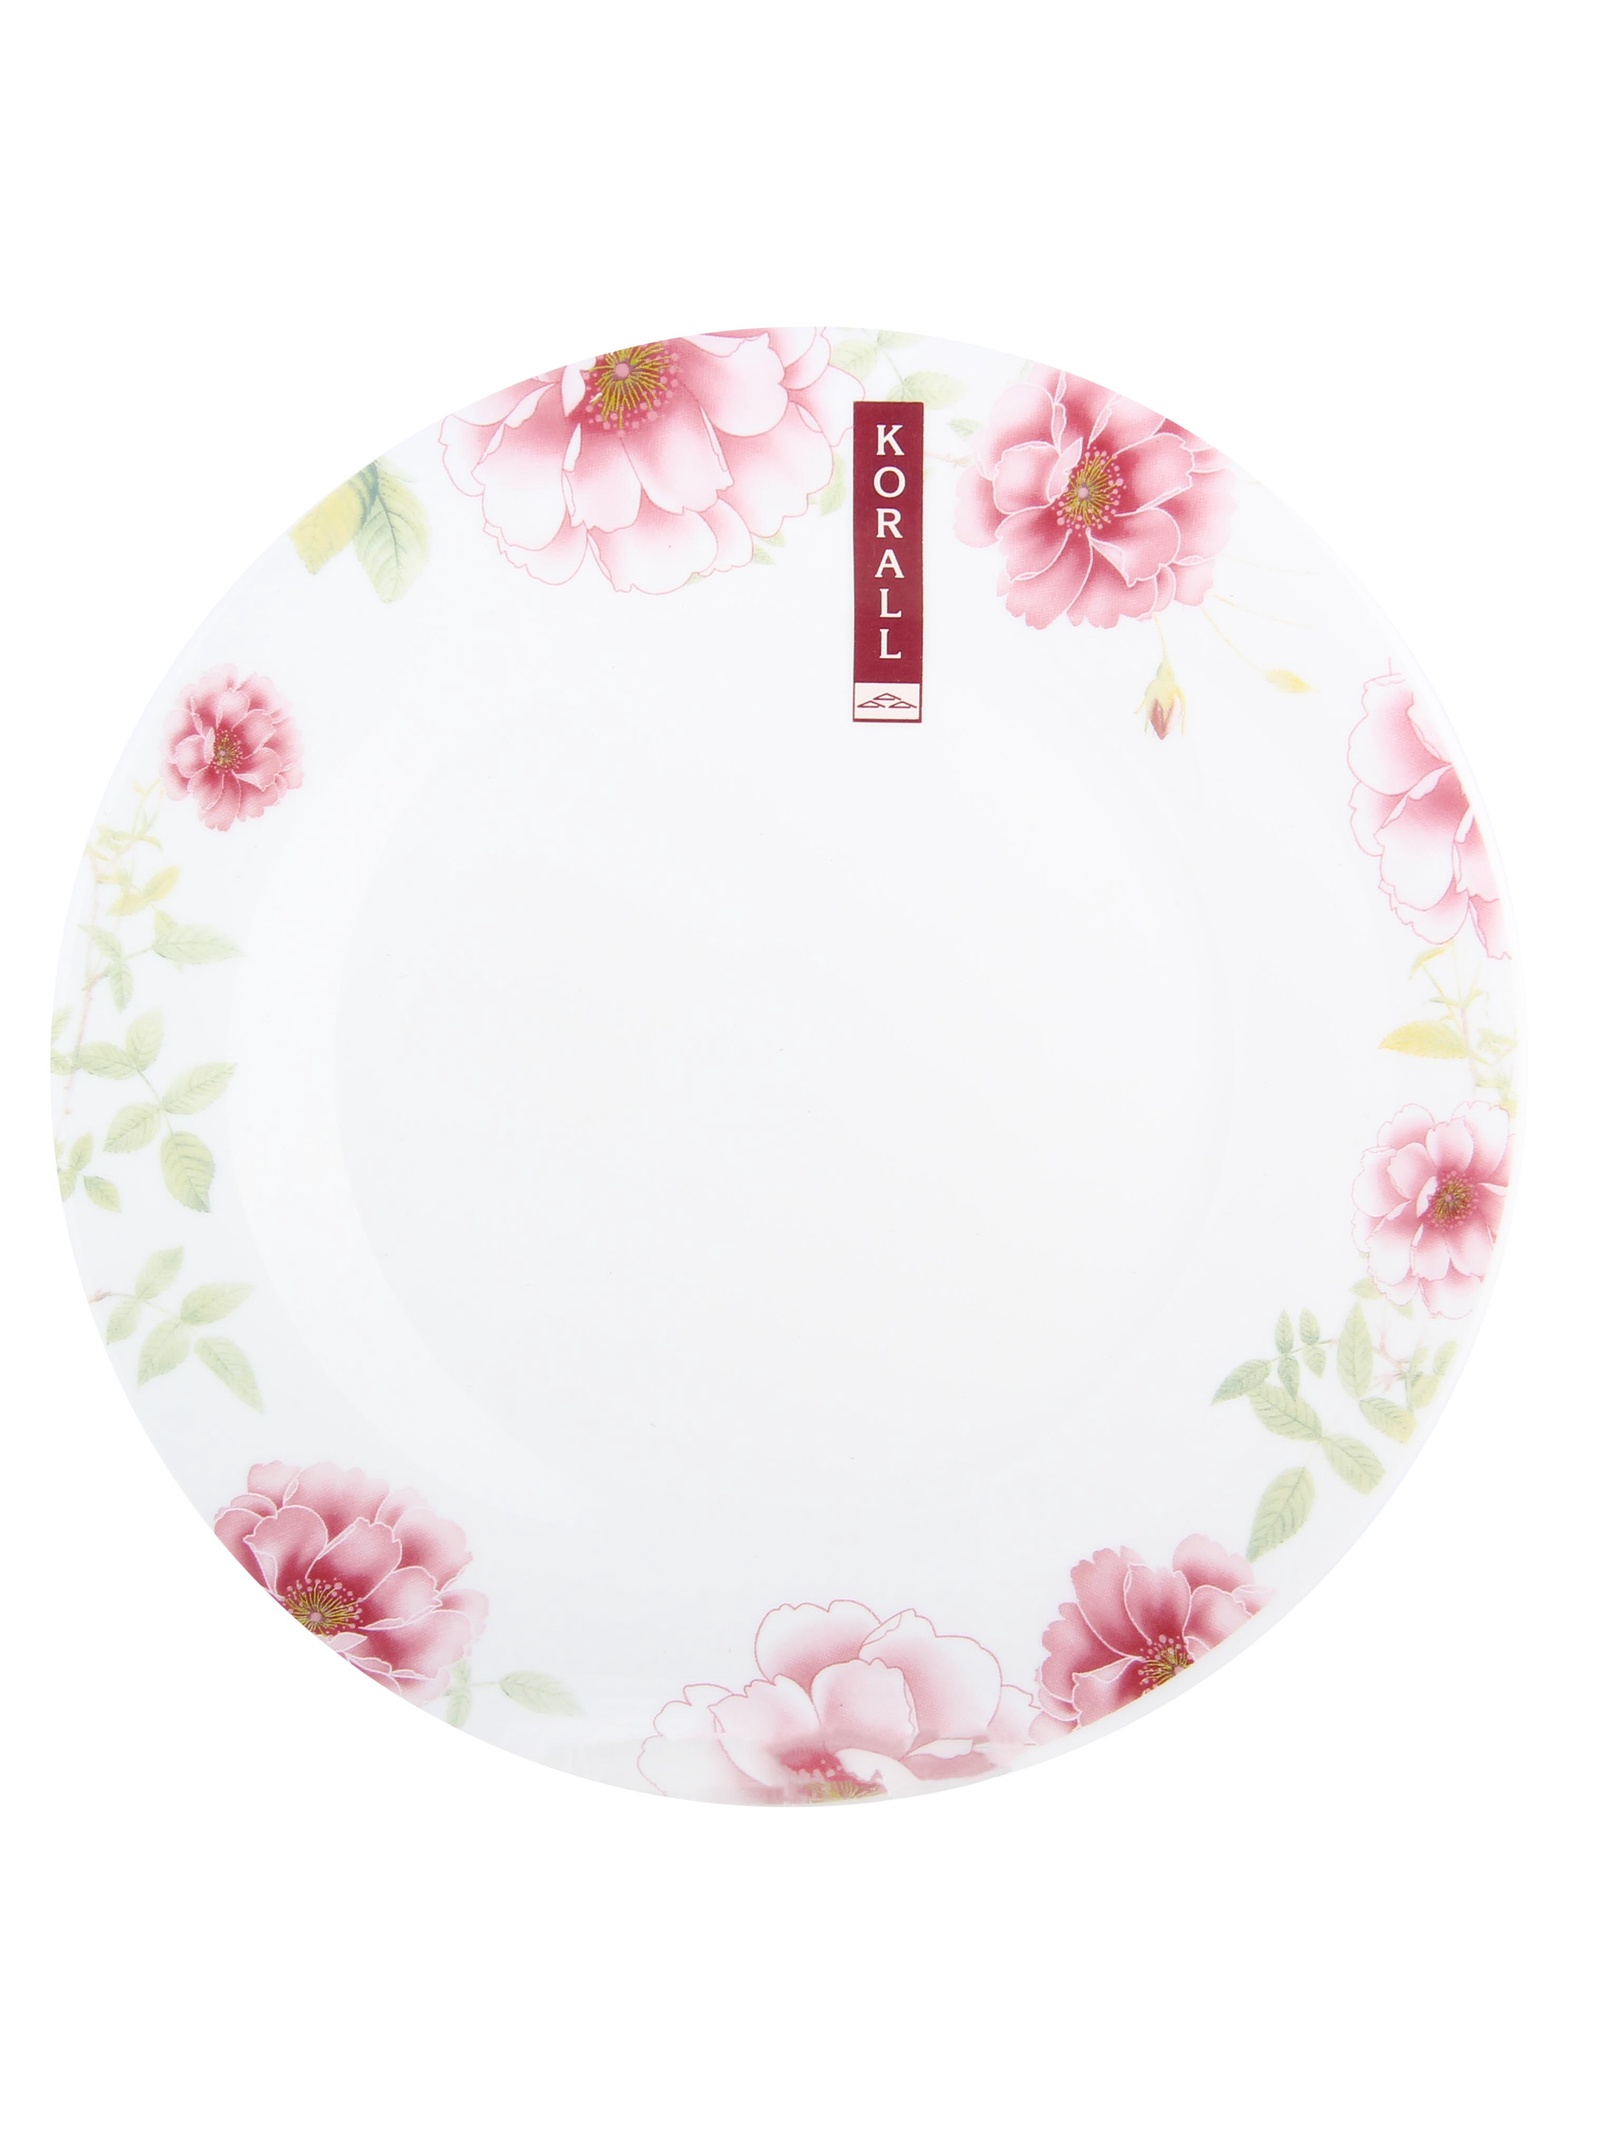 Тарелка мелкая Коралл 957598, Стеклокерамика плоская тарелка 21 см porland плоская тарелка 21 см